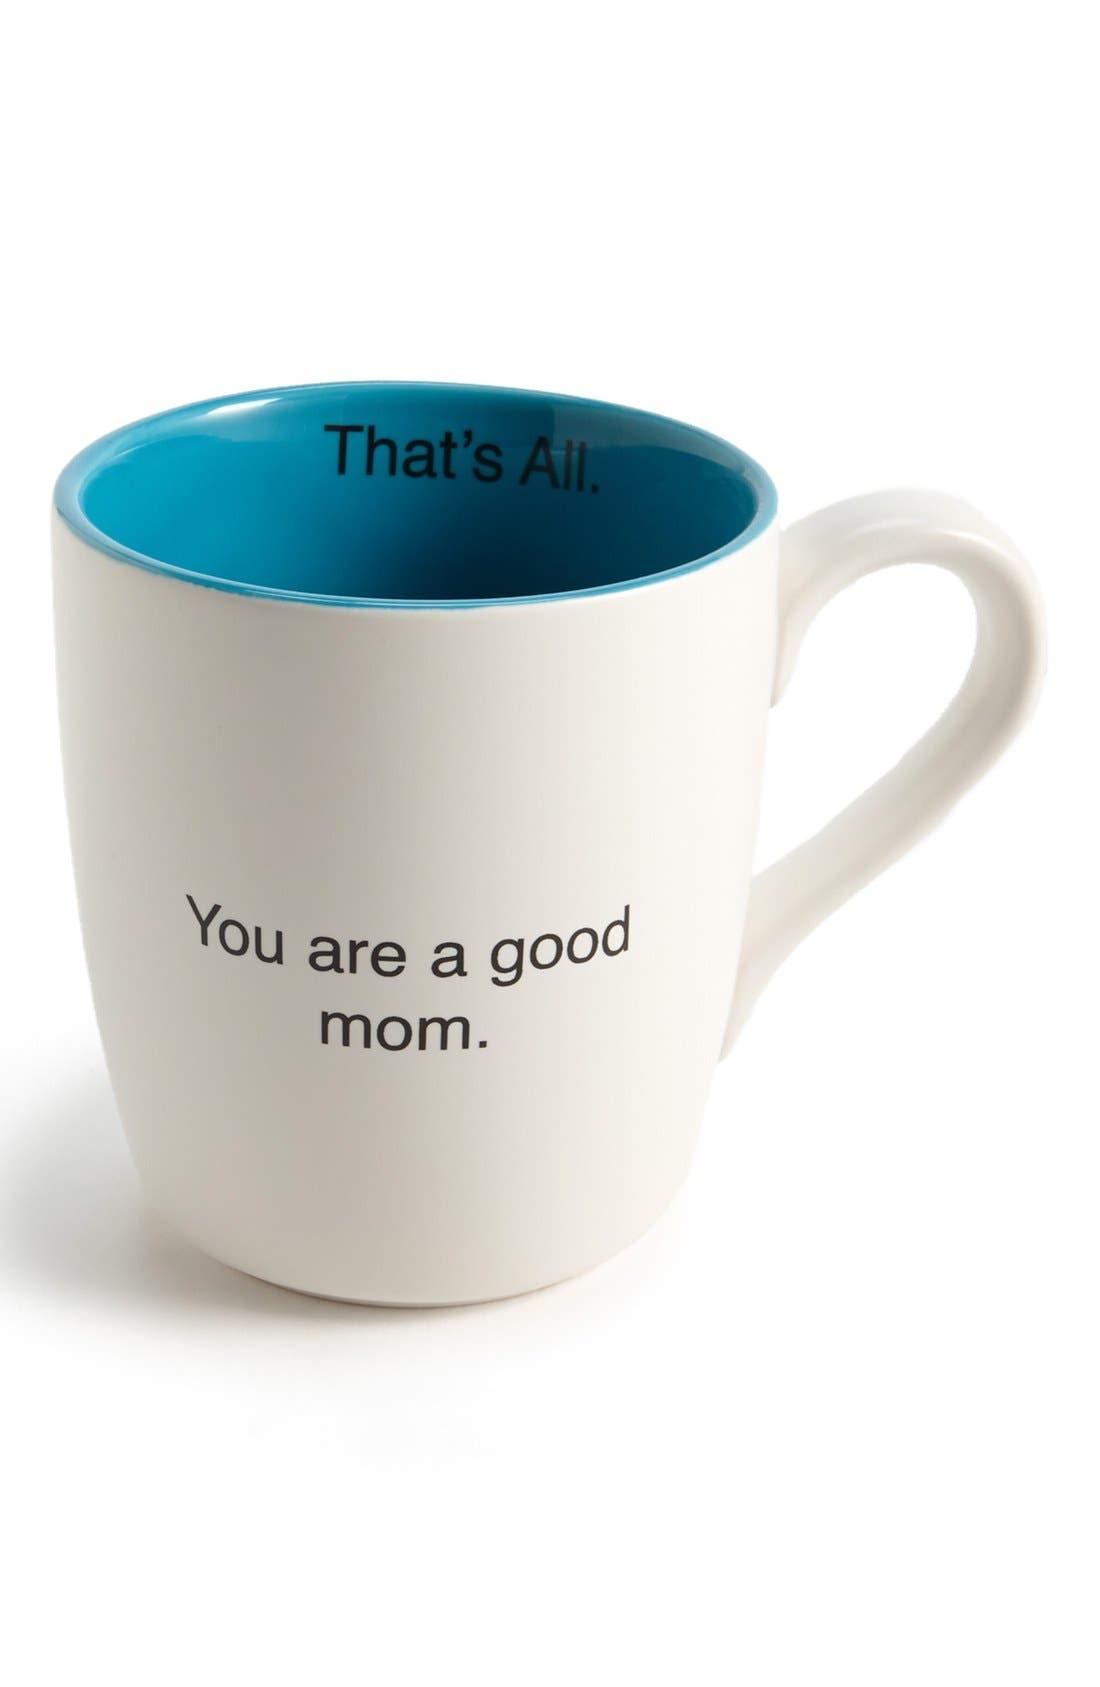 Main Image - 'That's All - You Are a Good Mom' Mug